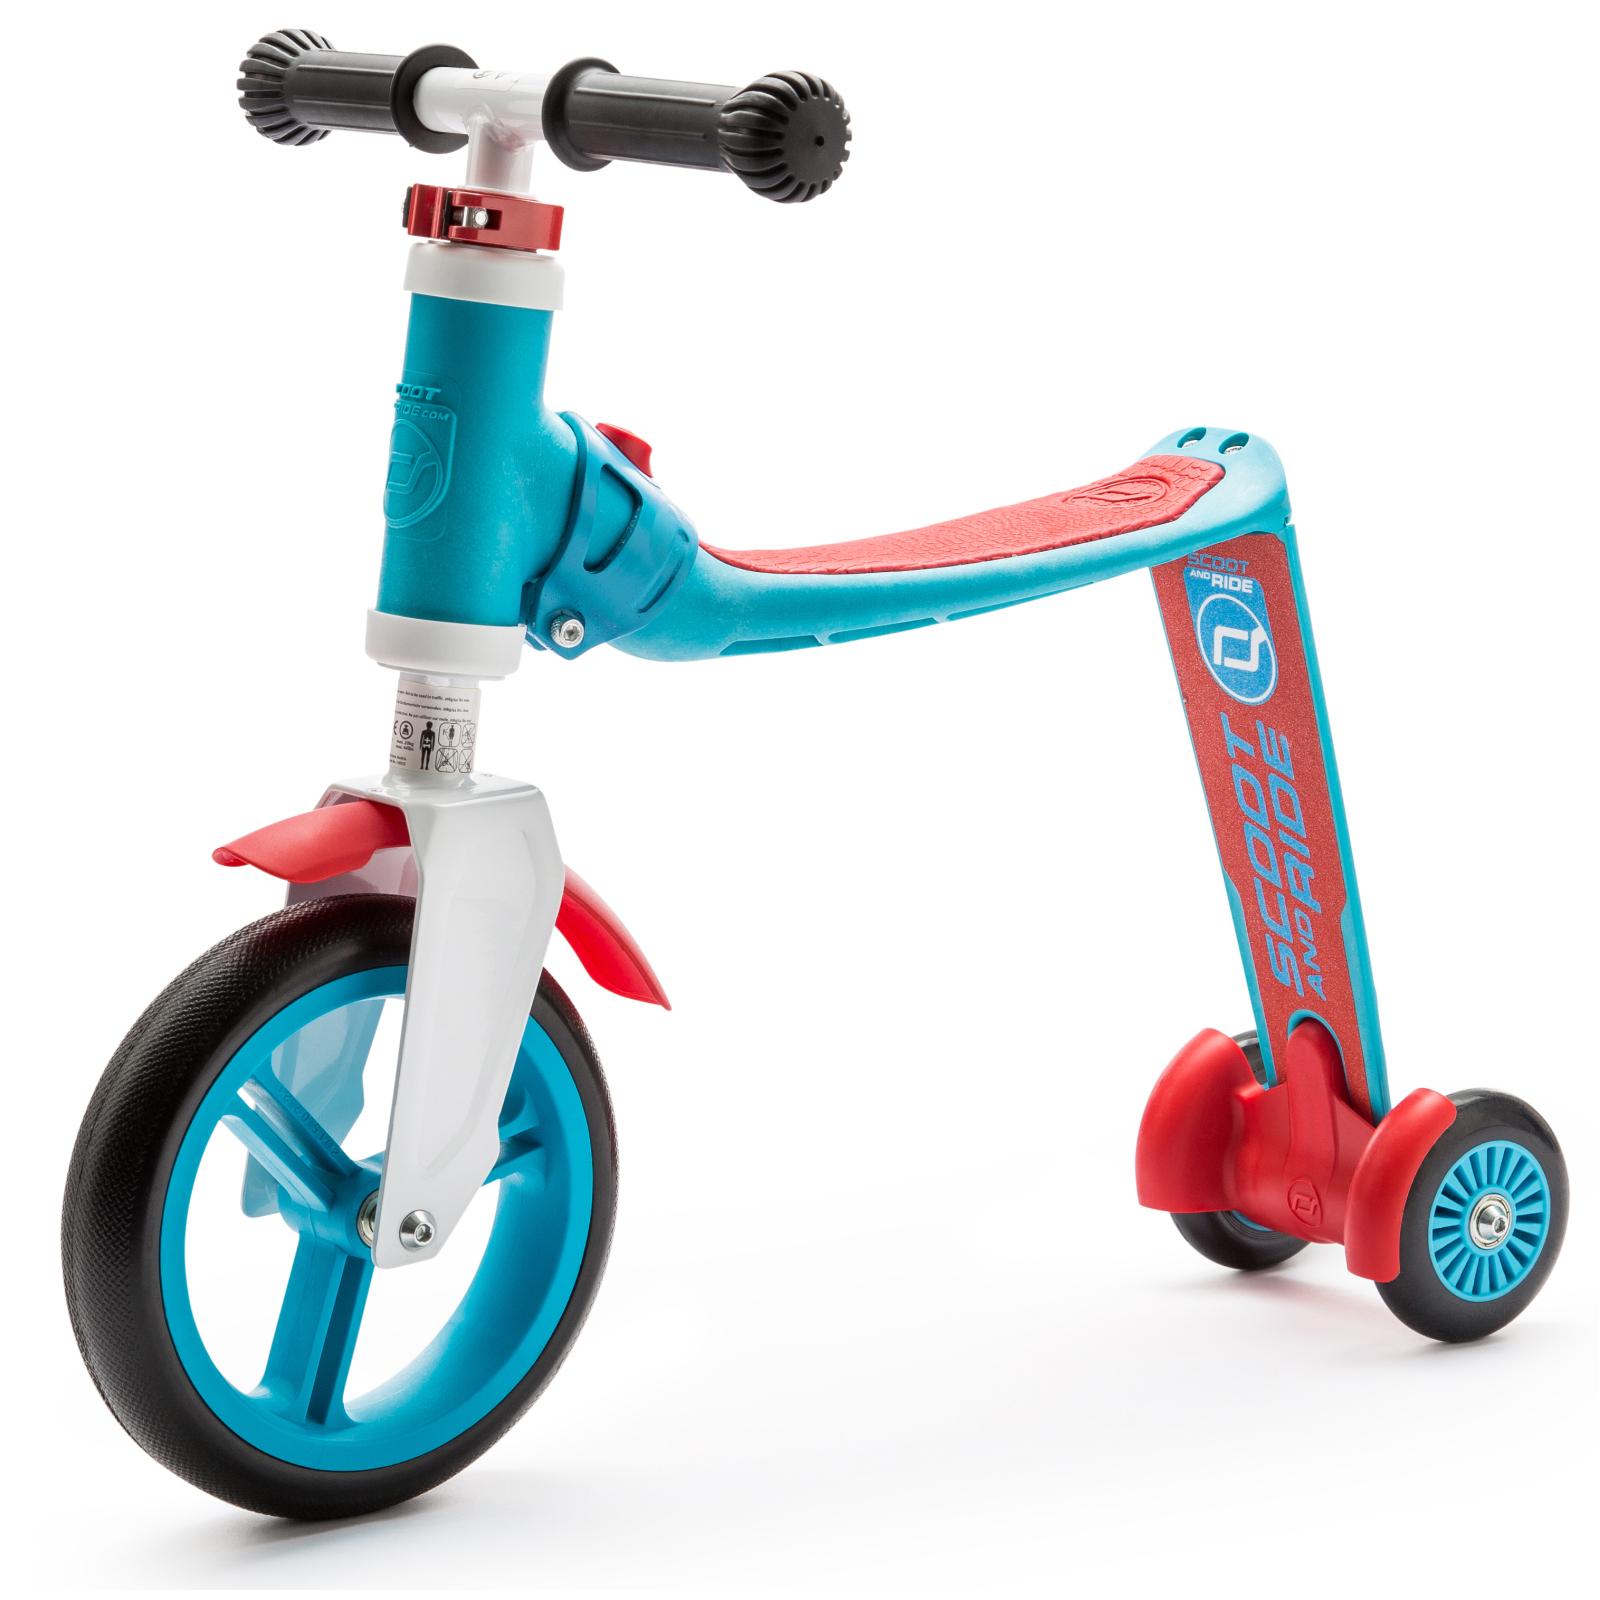 Самокат Scoot&Ride Highwaybaby+ сине-красный (SR-216272-BLUE-RED)